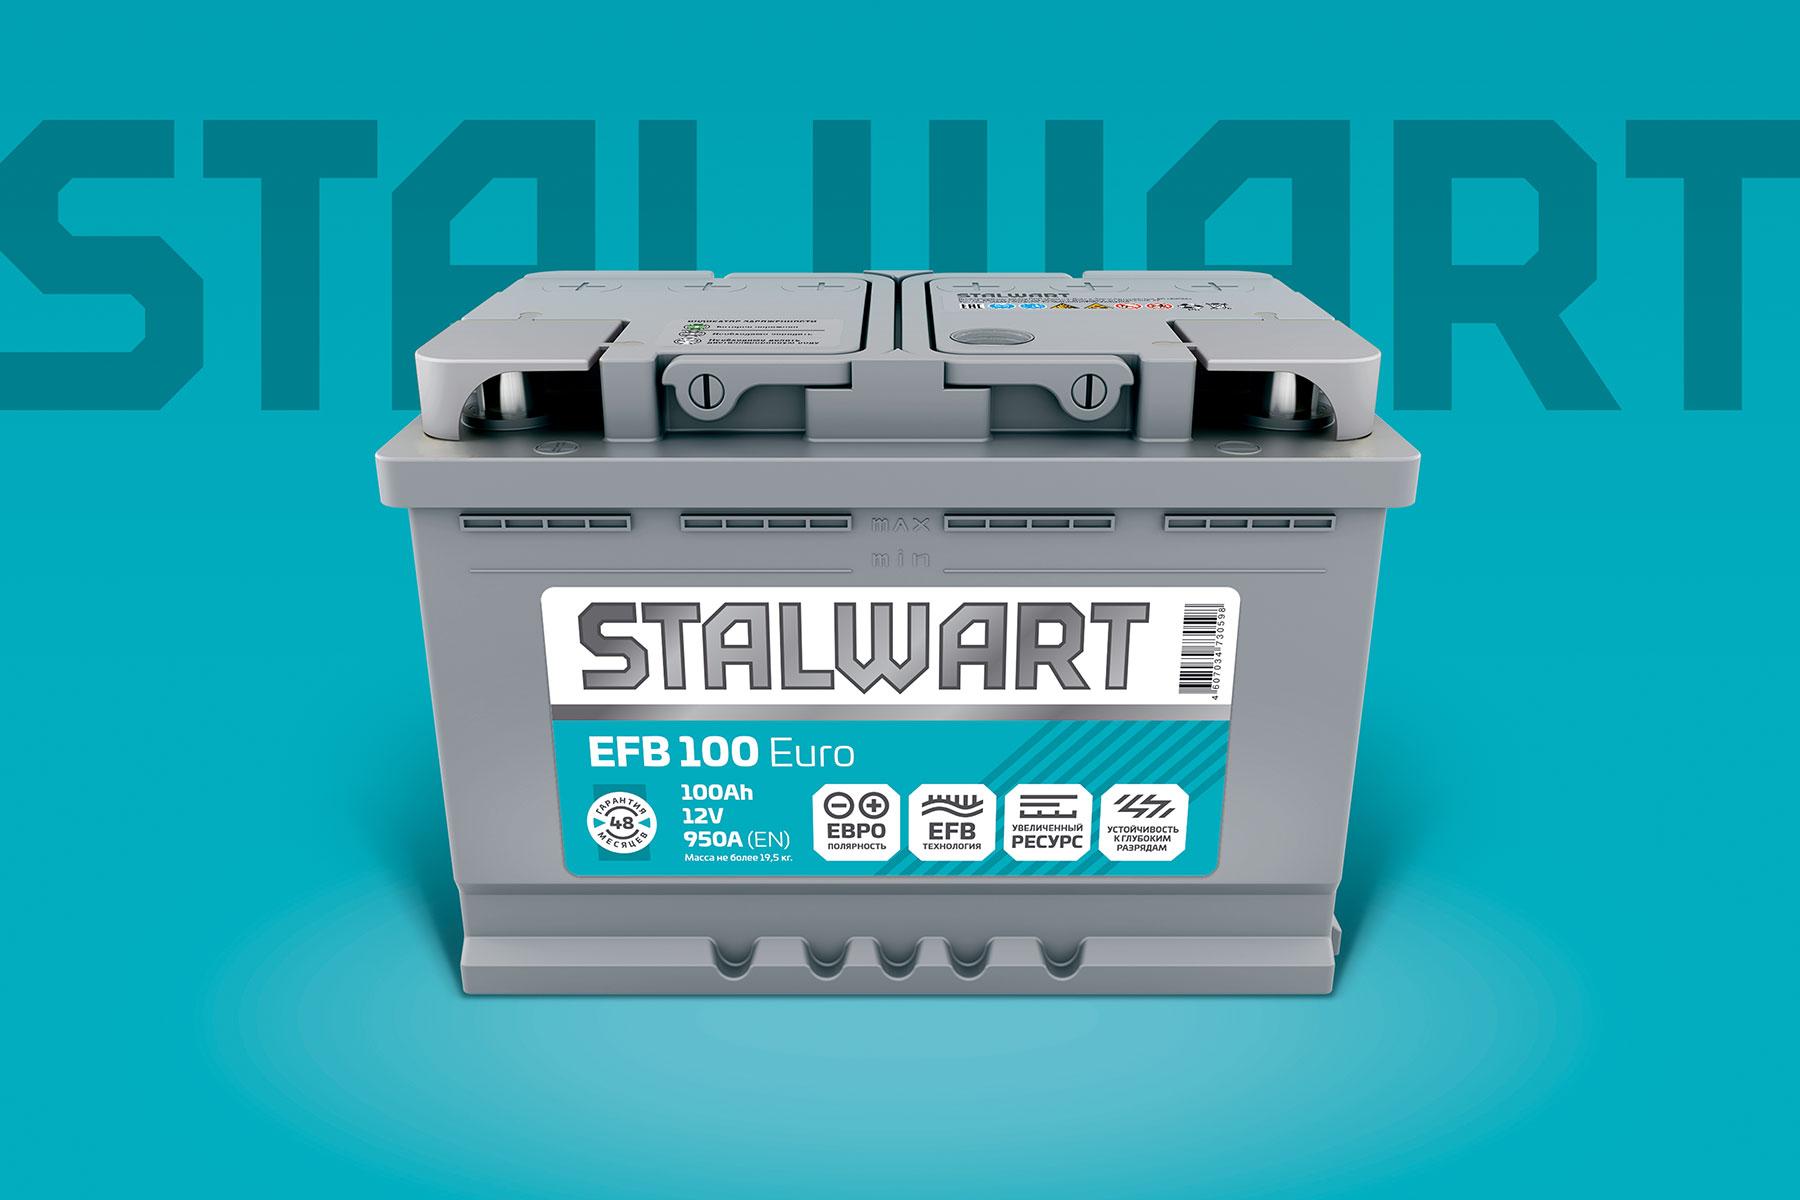 Stalwart-1-EFB-Front-1.jpg